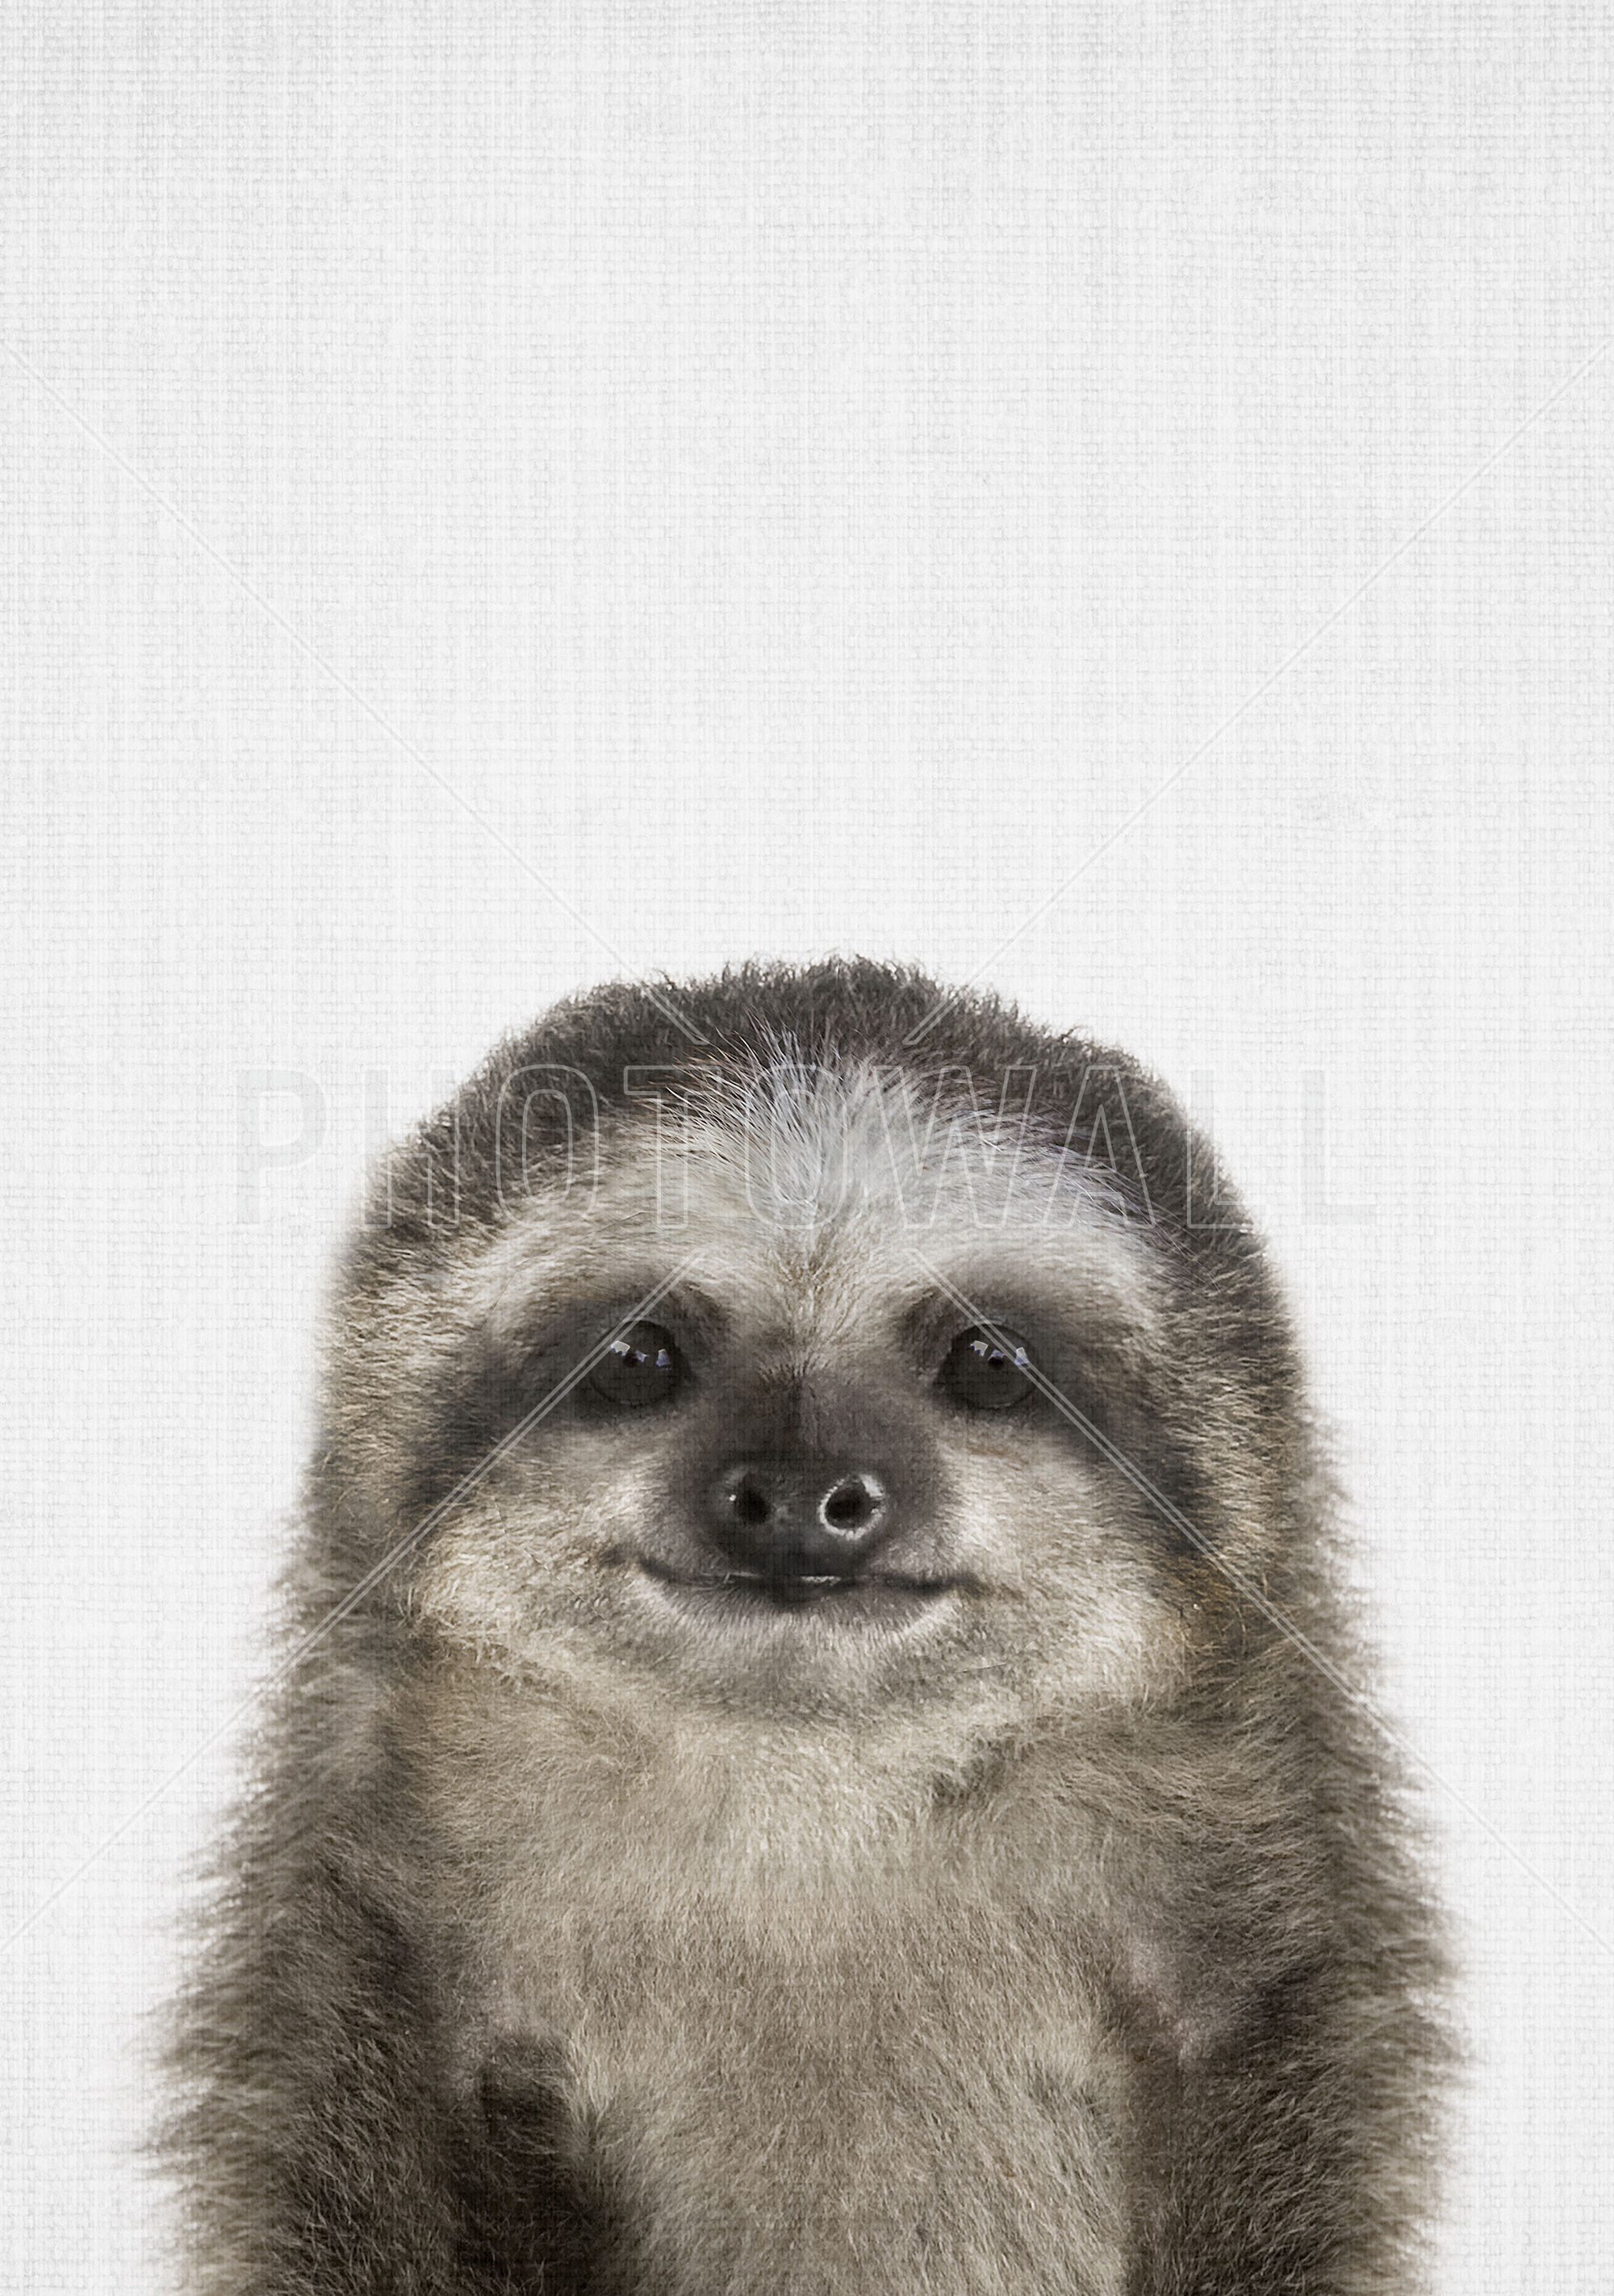 Baby Sloth Made To Measure Wall Mural Photowall